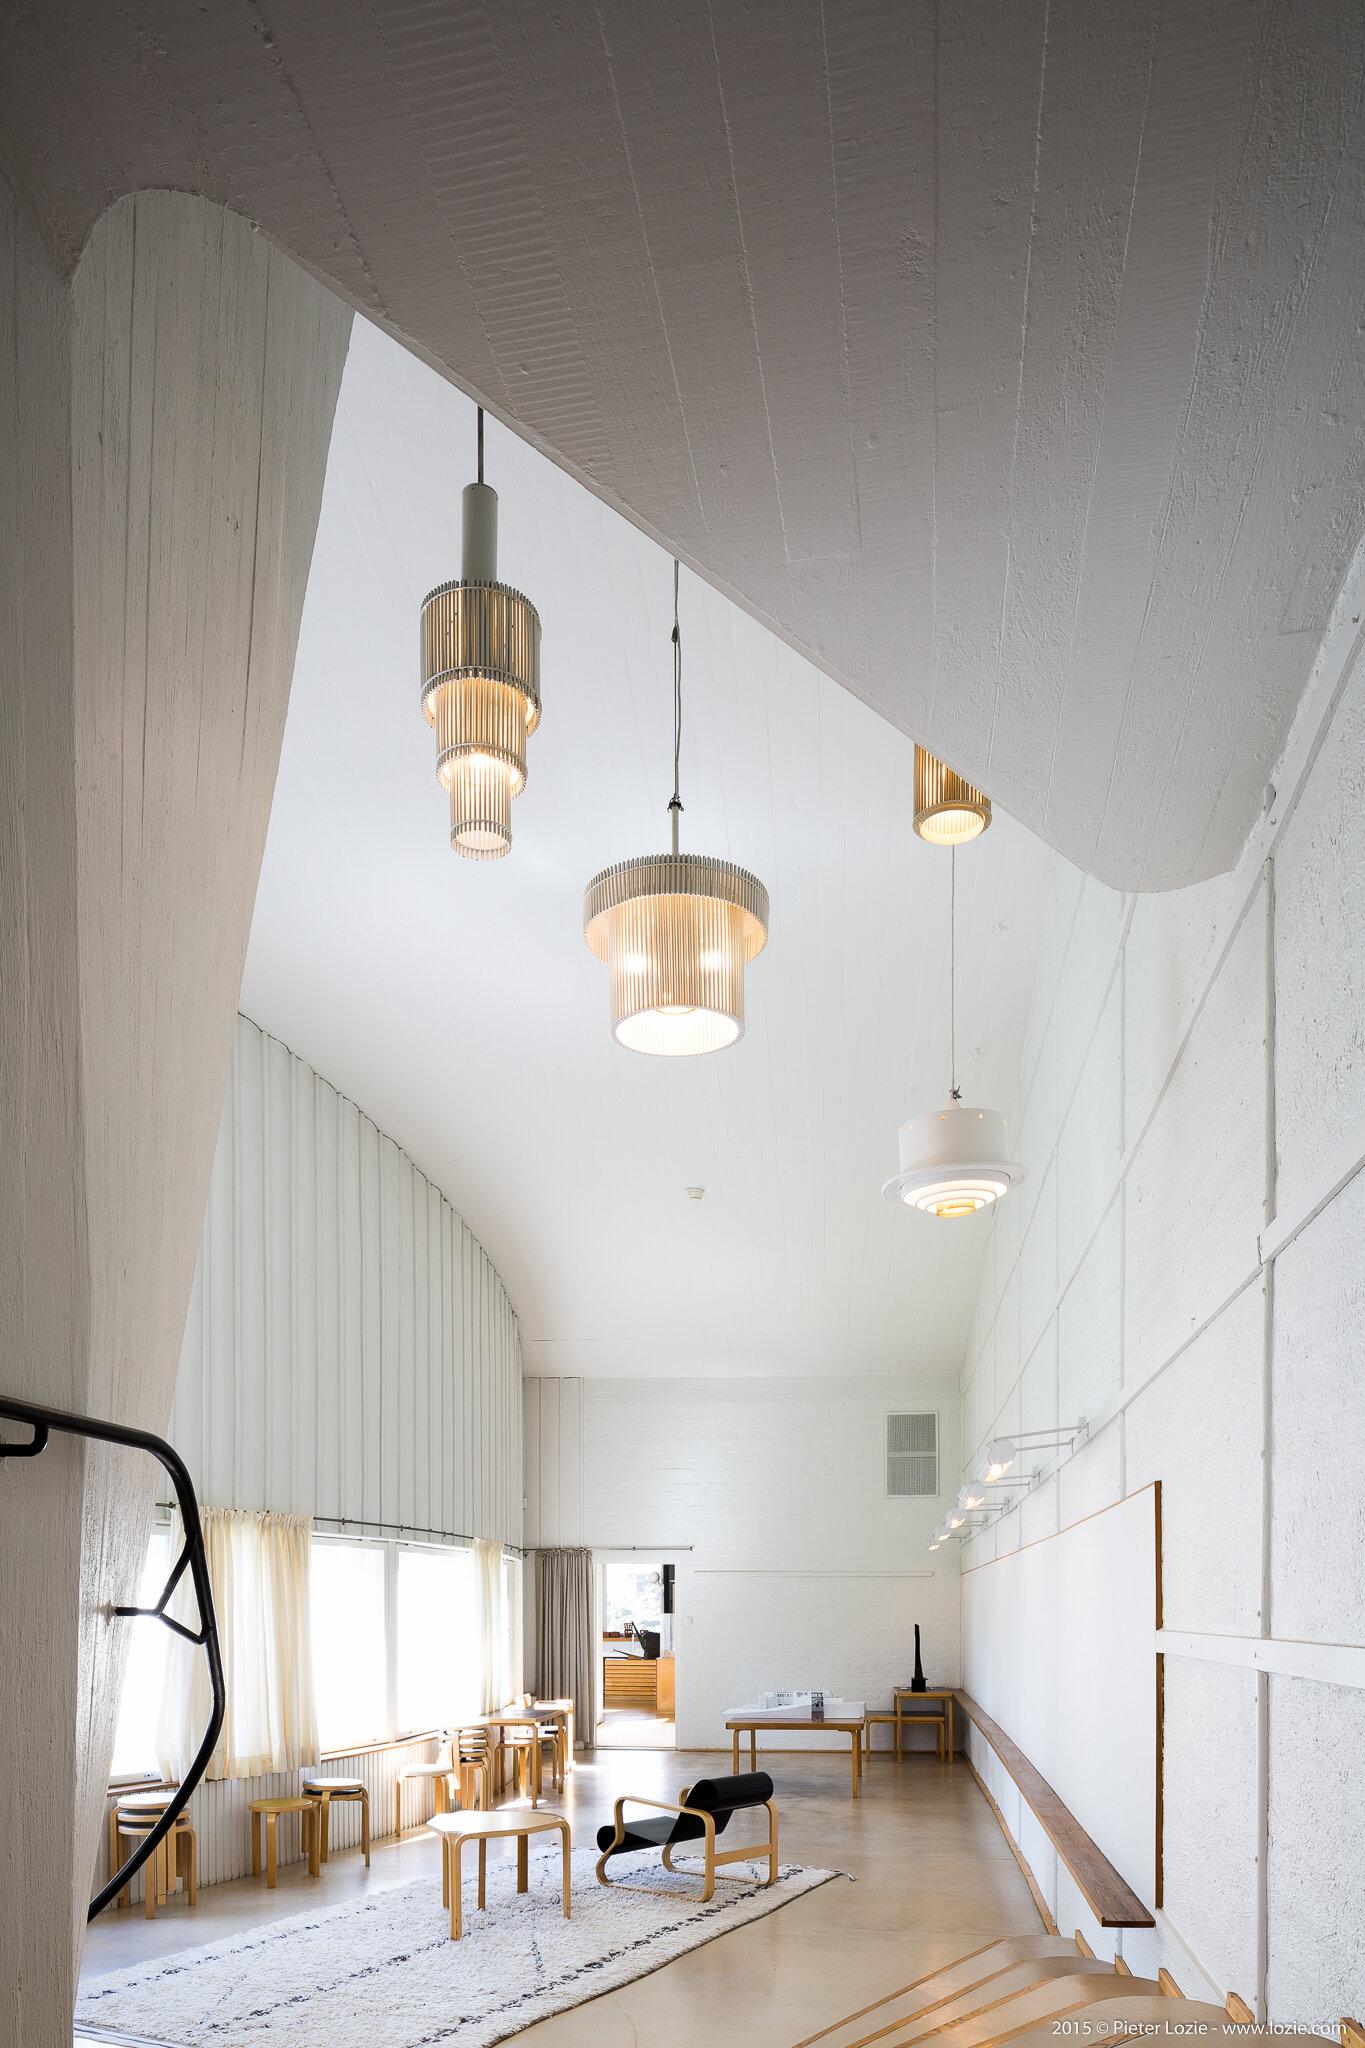 Alvar Aalto Studio, Helsinki, Finland (1955)  Photo by: Pieter Lozie Photography